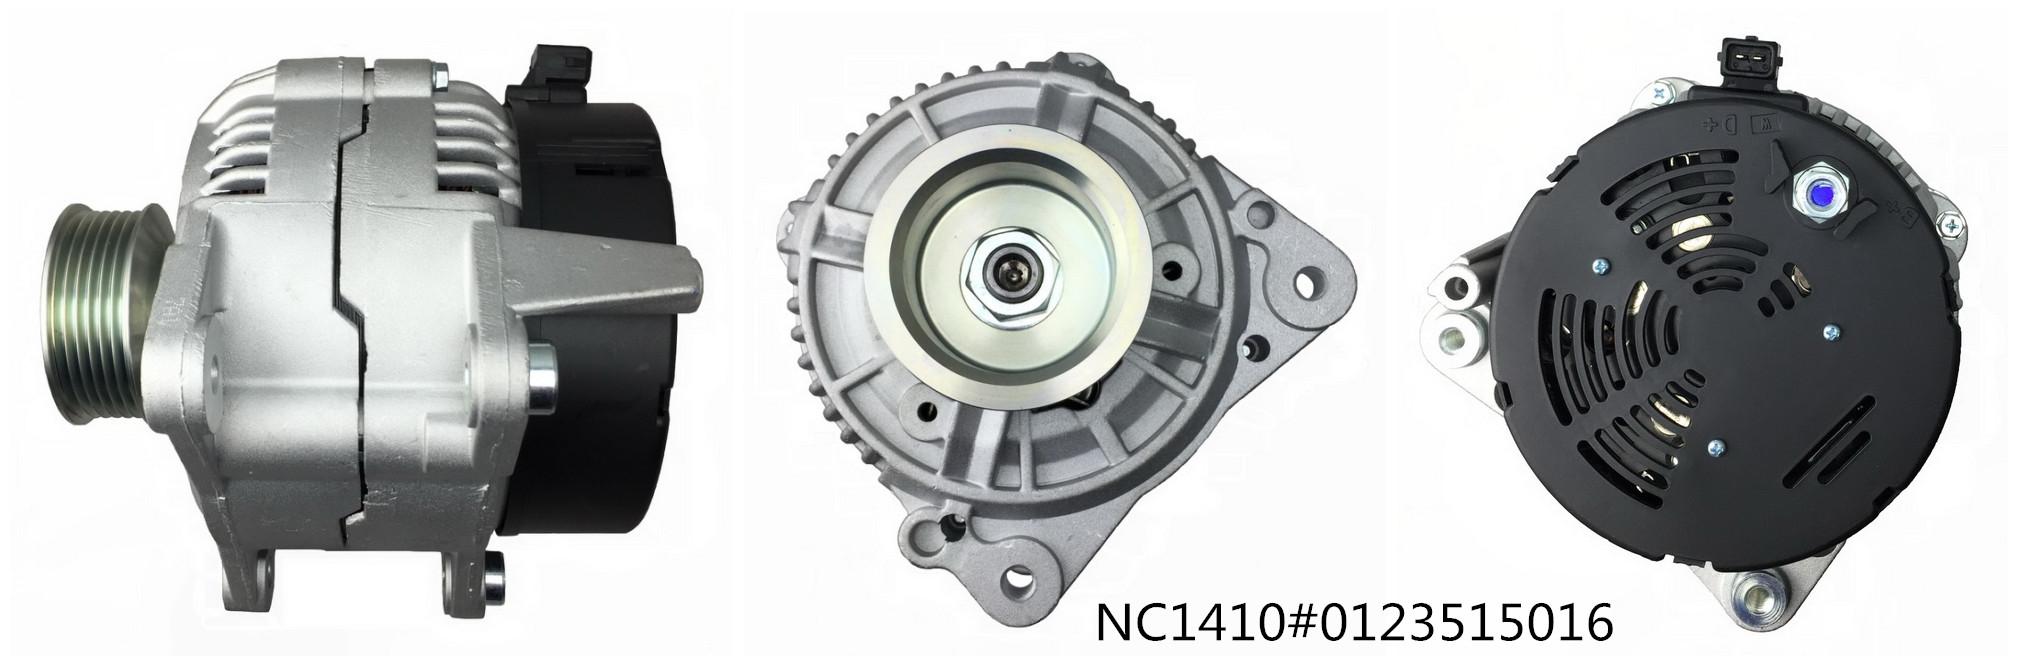 Auto alternator NC1410 (12V 120A, 0123515016)